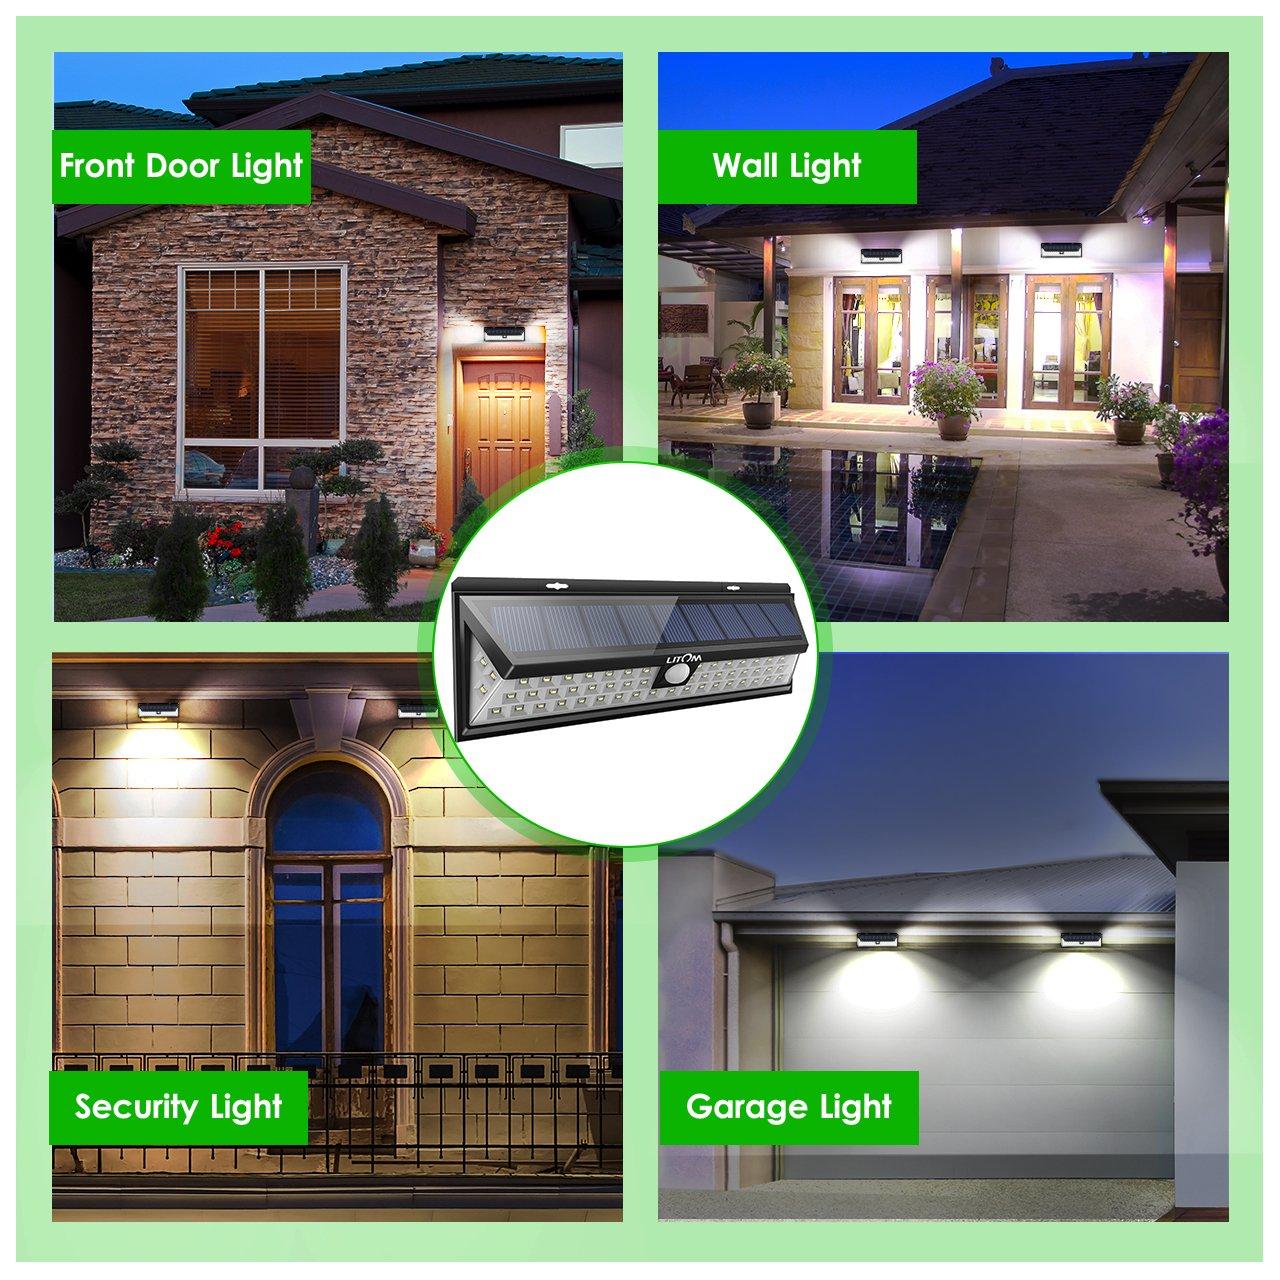 Litom Super Bright Solar Lights 54 LED Solar Power Outdoor Motion Sensor Light With LED on Both Side by Litom (Image #6)